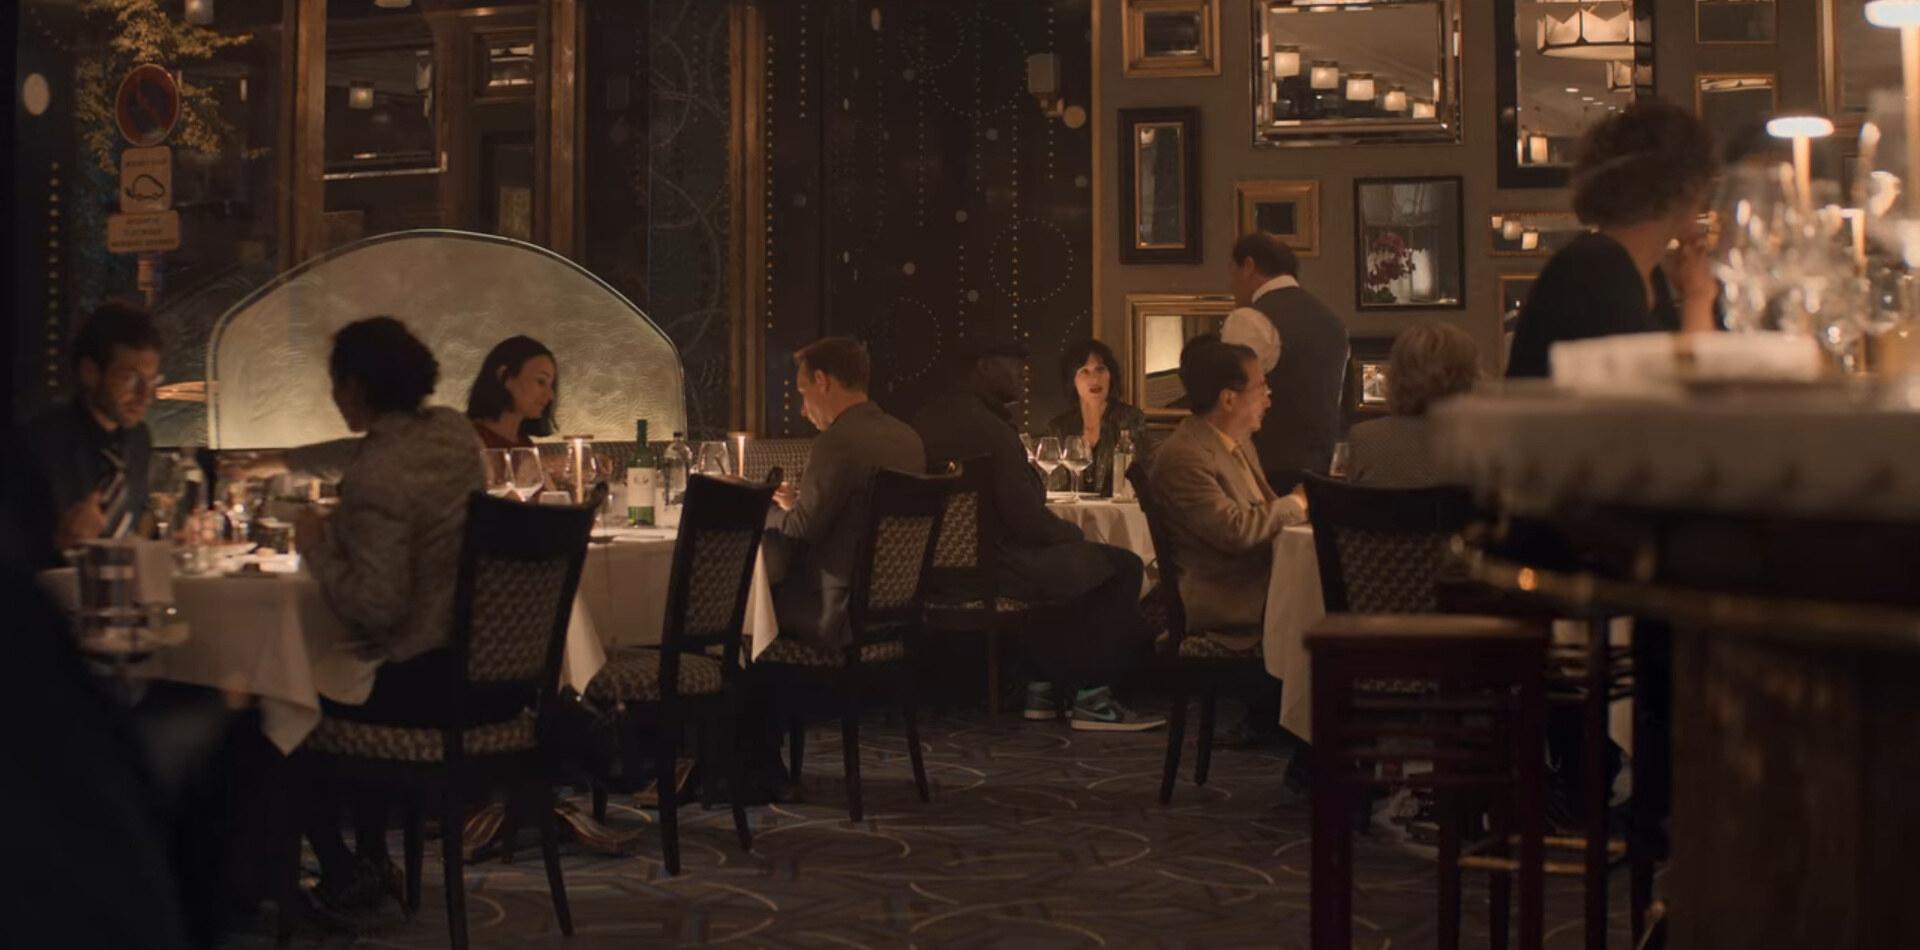 Lupin Netflix Parte 2 Air Jordan 1 Mid Acqua